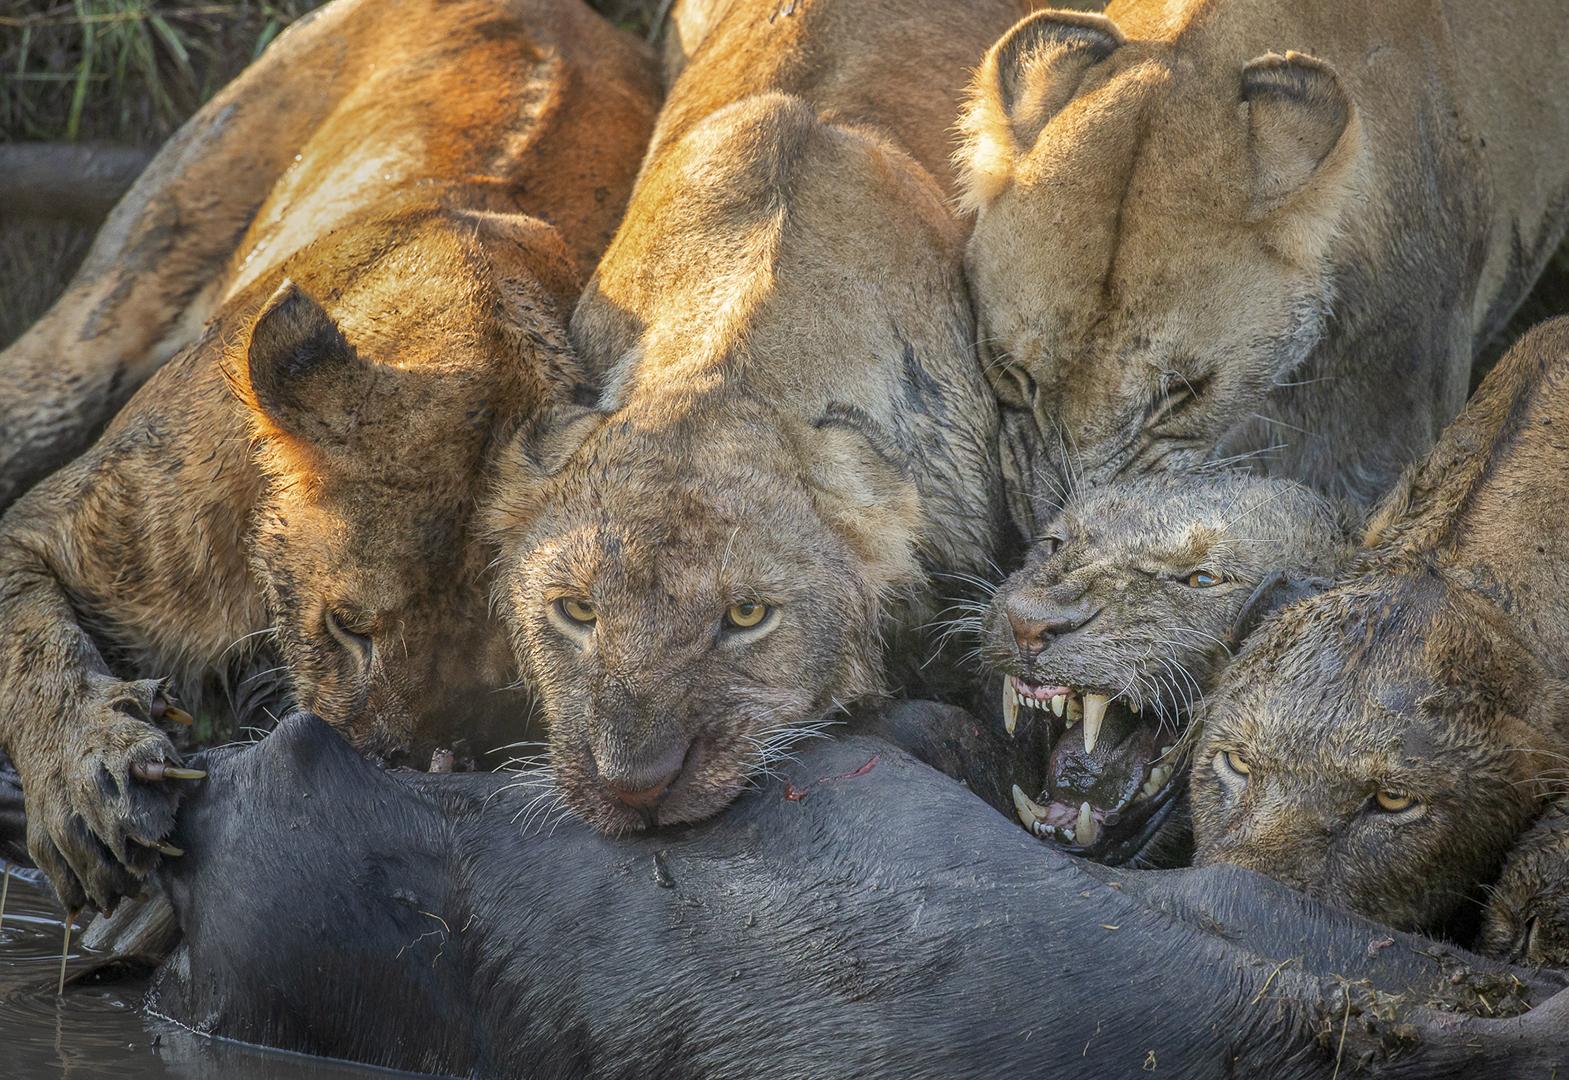 Five muddy lions feeding on a wildebeest